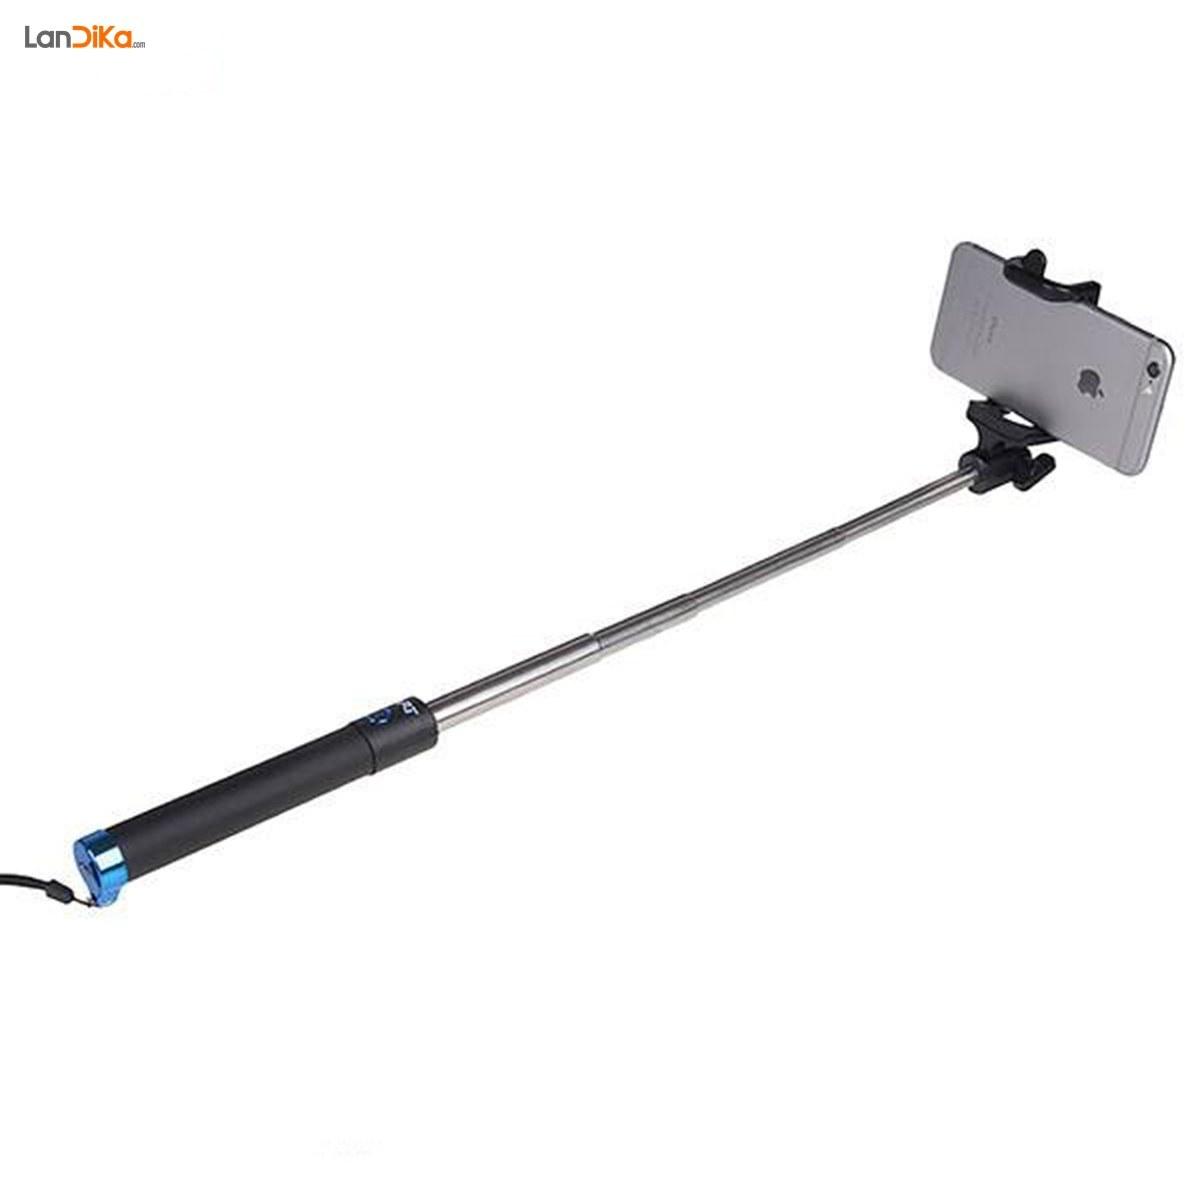 تصویر مونوپاد بی سیم بلوتوثی ART مدل Selfie Stick ART